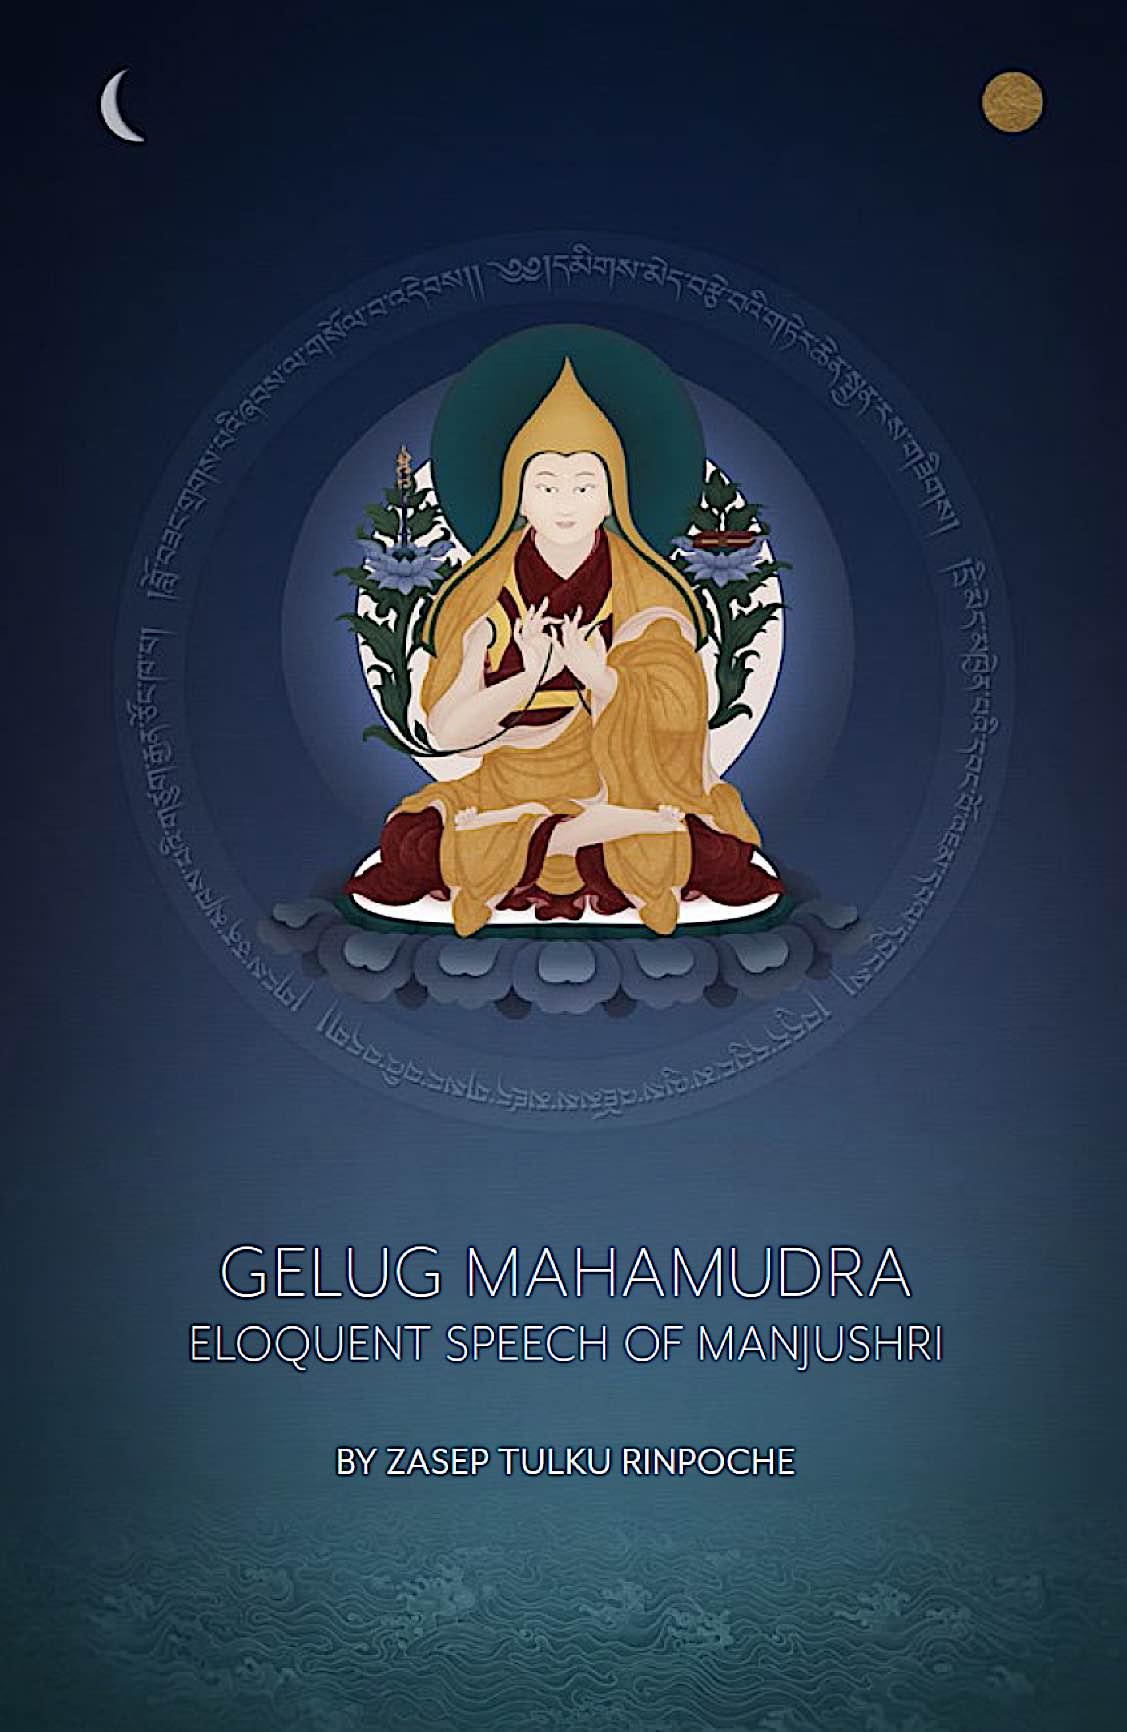 Buddha Weekly Gelug Mahamudra Eloquent Speech of Manjushri Zasep Tulku Rinpoche book Buddhism